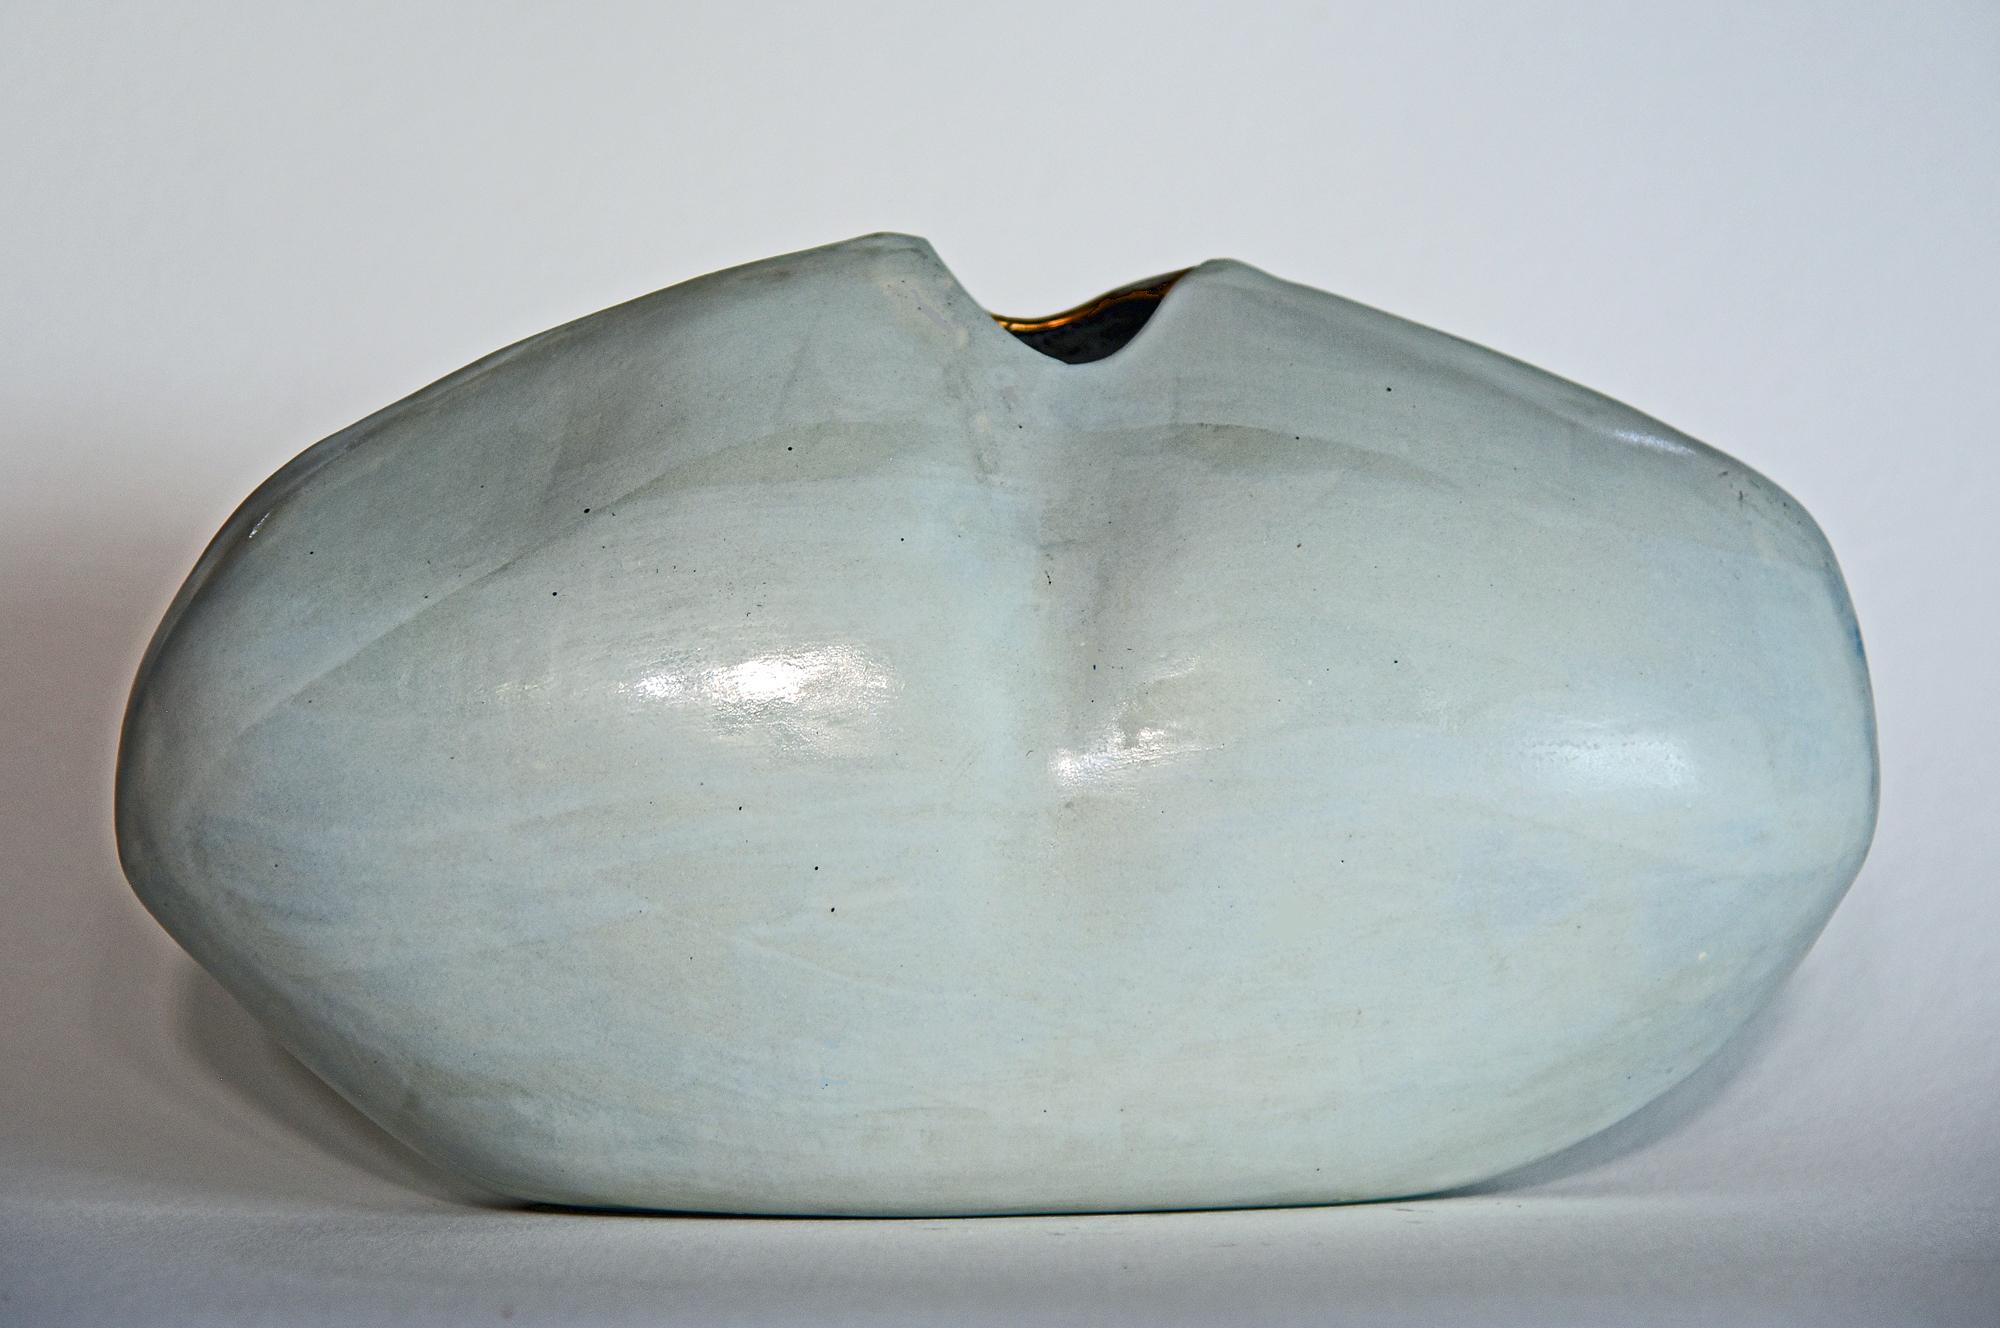 white oval vessel